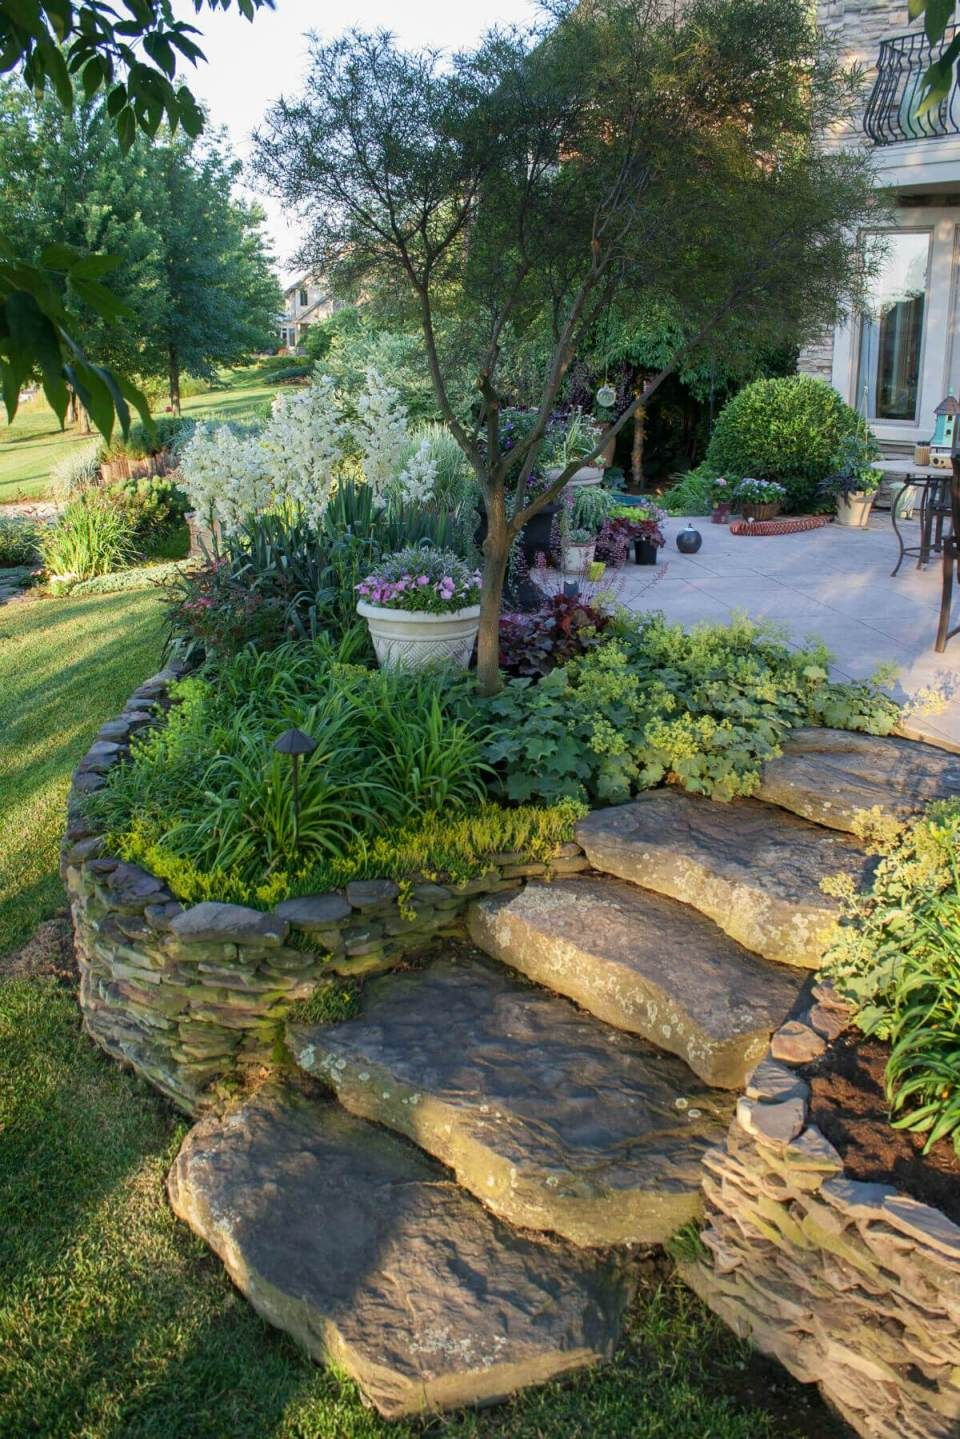 21 Best Sloped Backyard Ideas Designs On A Budget For 2020 Sloped Backyard Large Yard Landscaping Rock Garden Landscaping